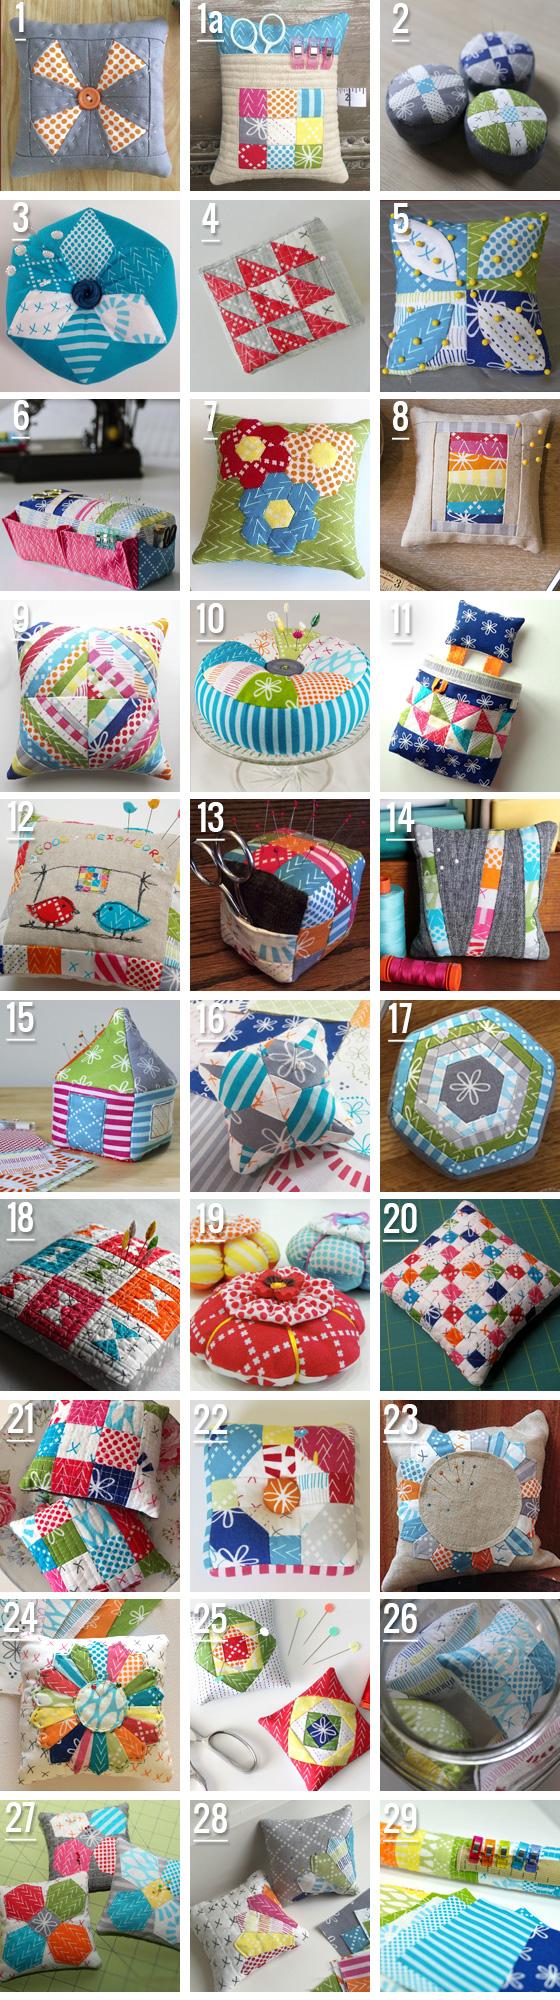 Wuiih...lots and lots of pincushion ideas..love them! | PinCushions ...